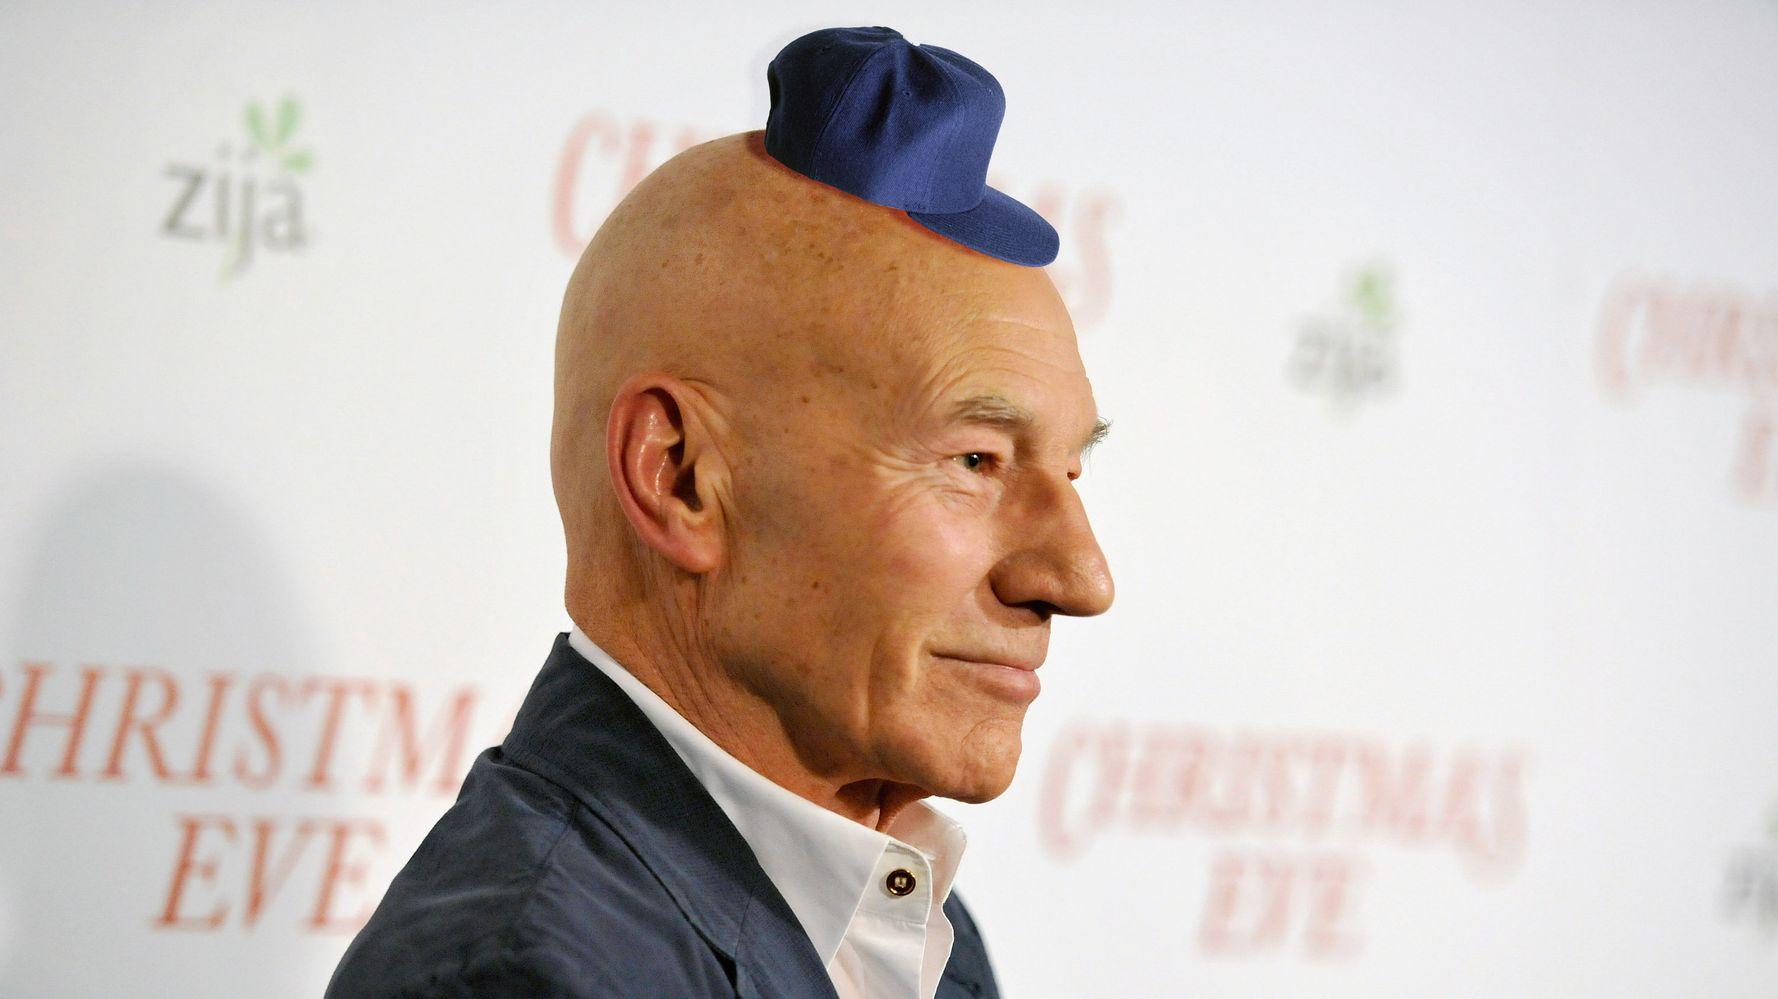 Do hats cause balding?